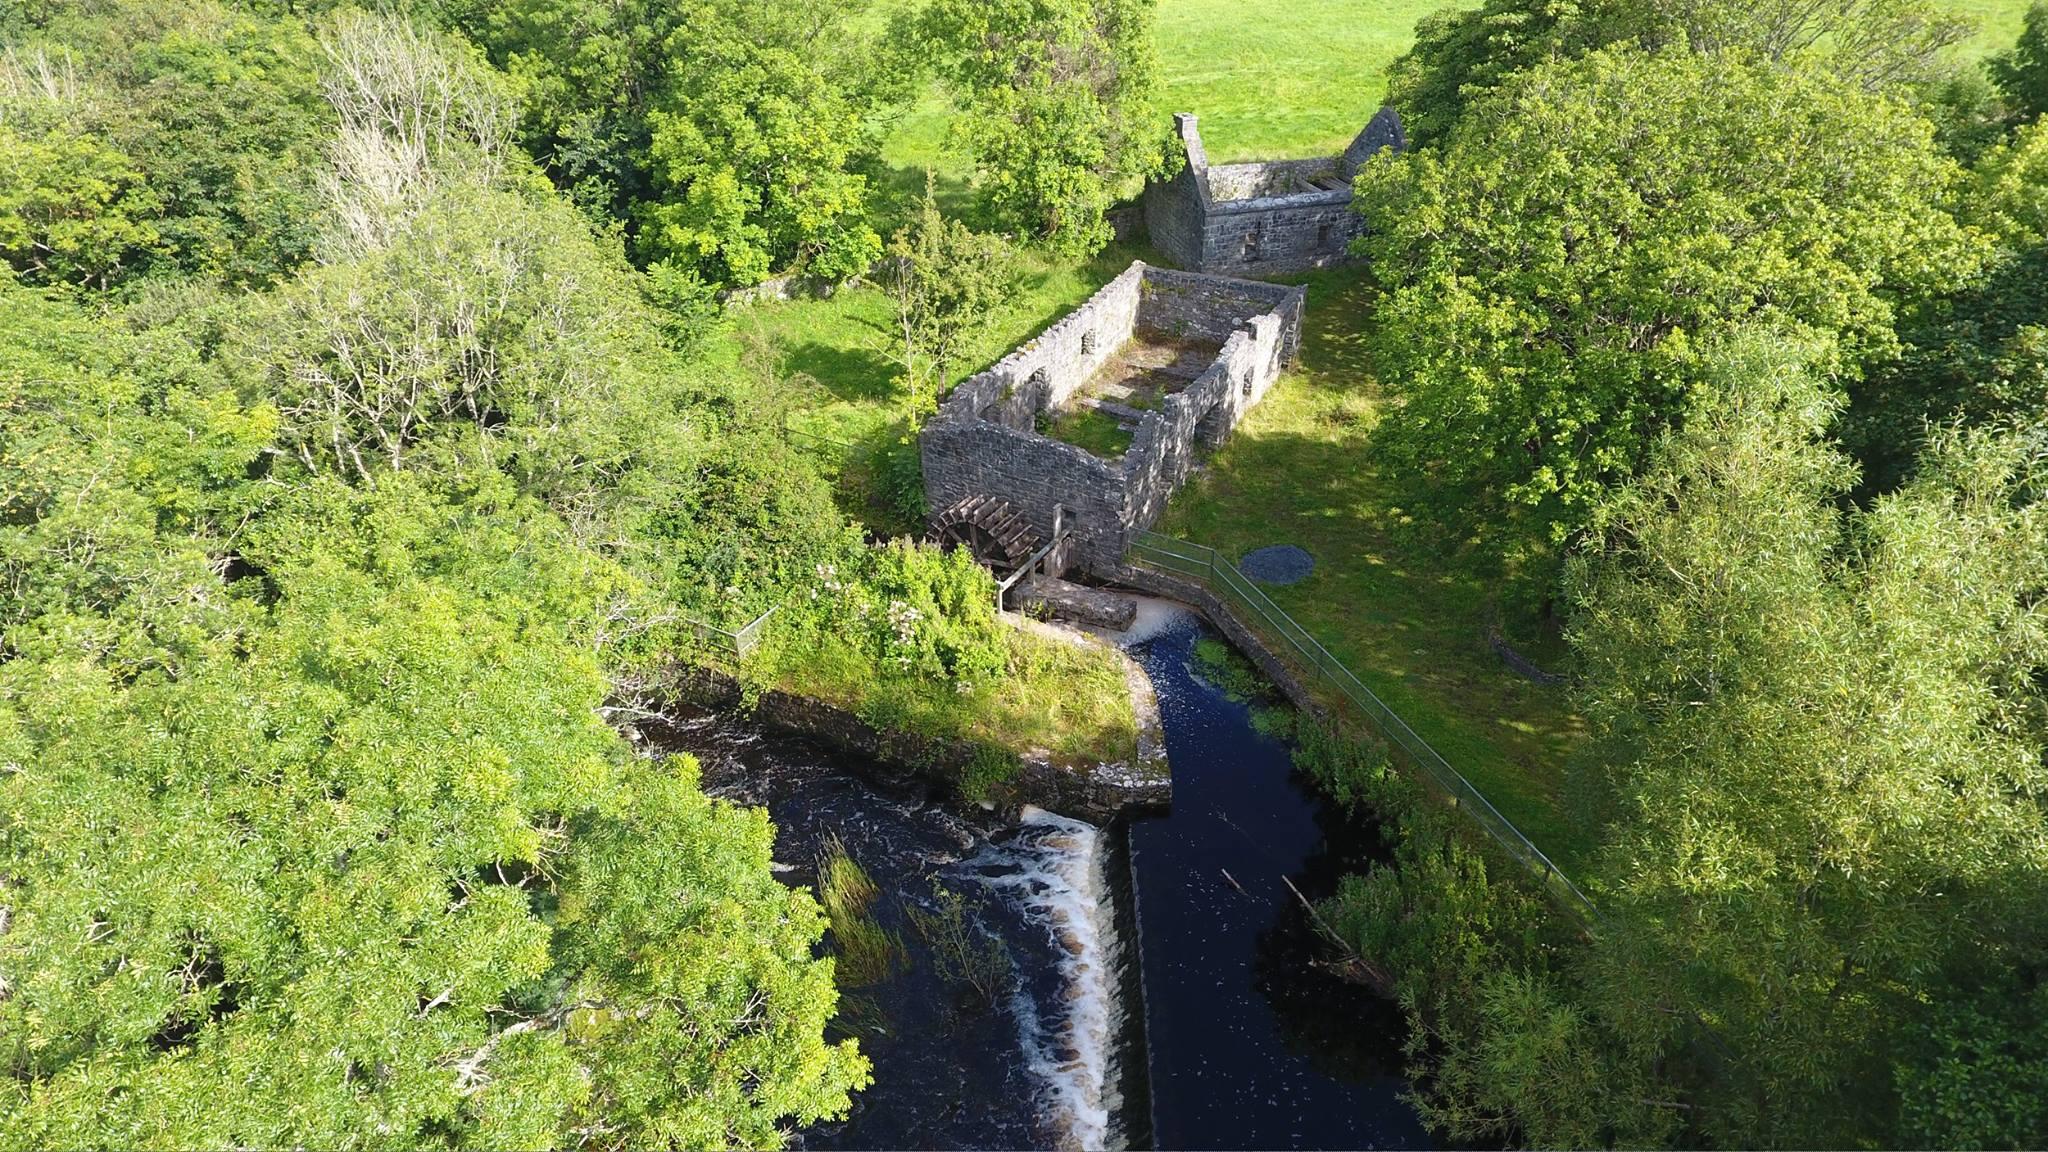 Ballylee Mill Aerial Photo - Visit Galway